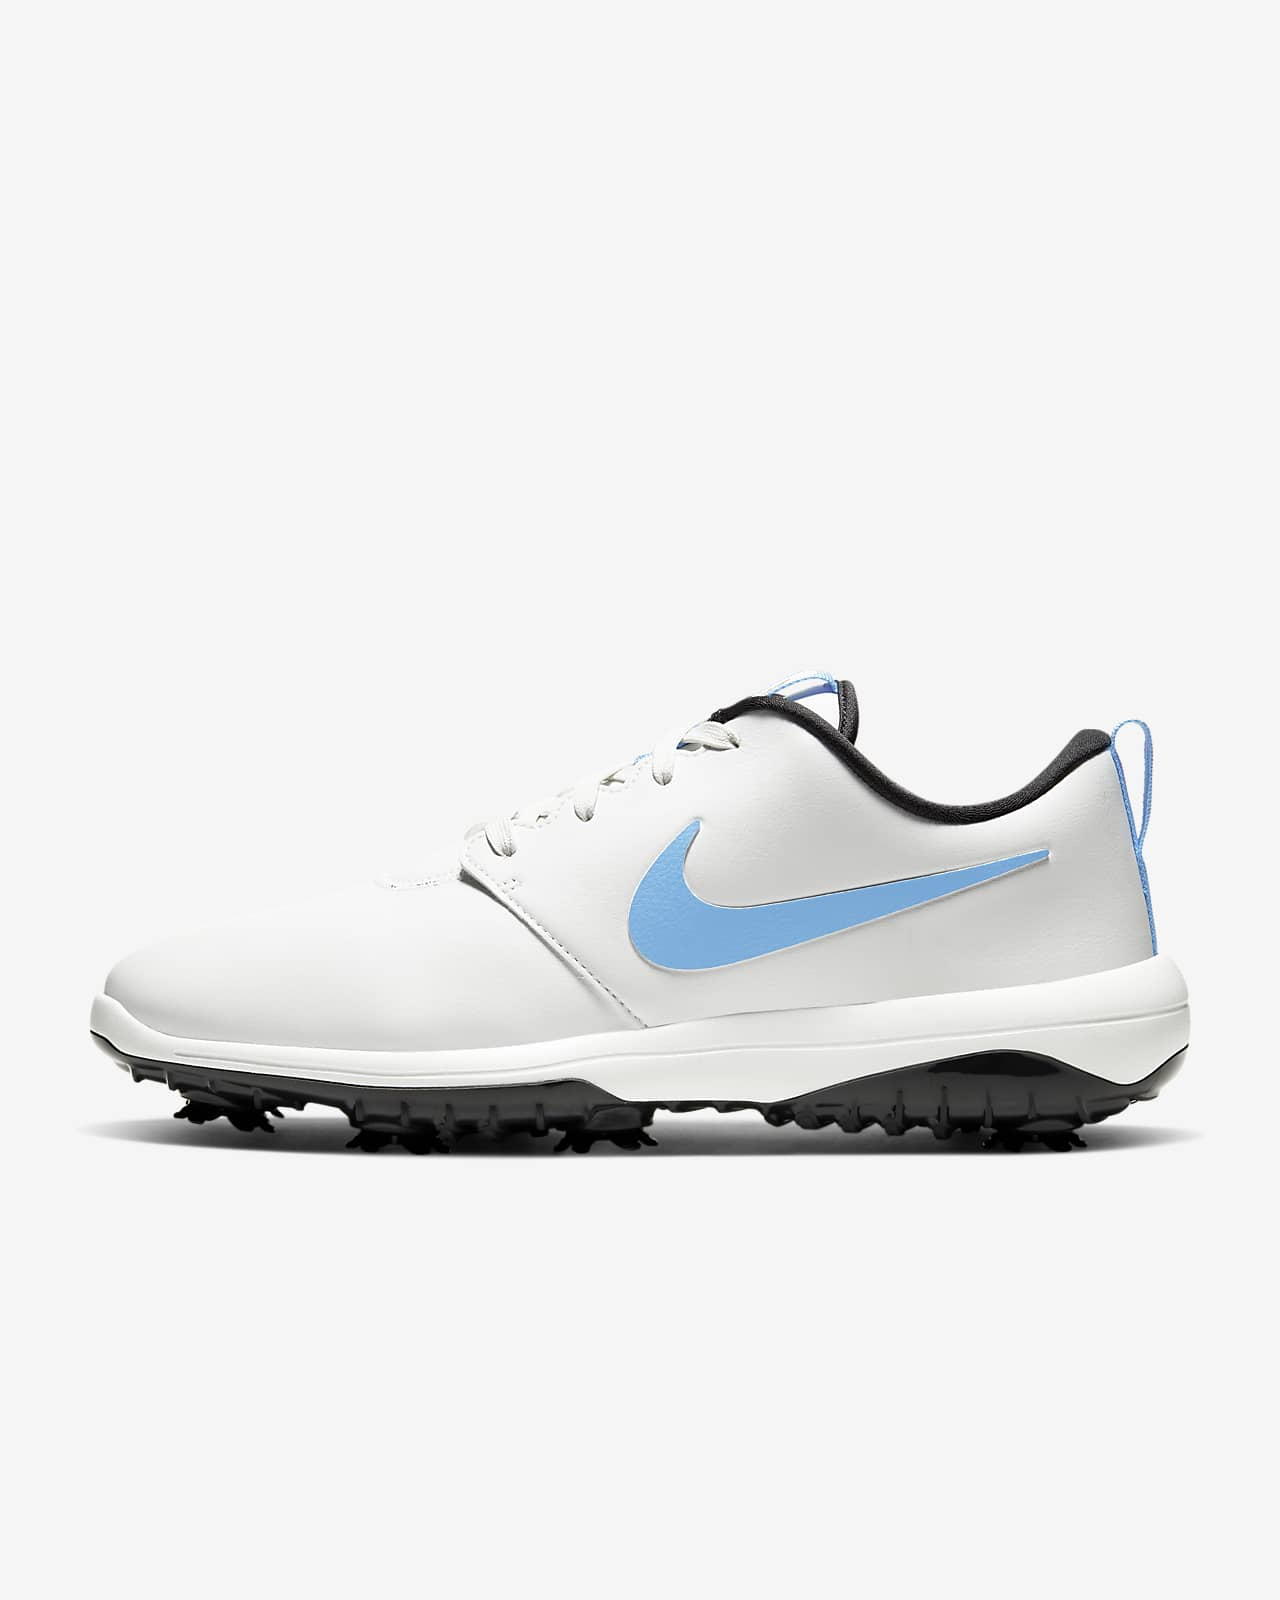 Nike Roshe G Tour Men S Golf Shoe Nike Gb